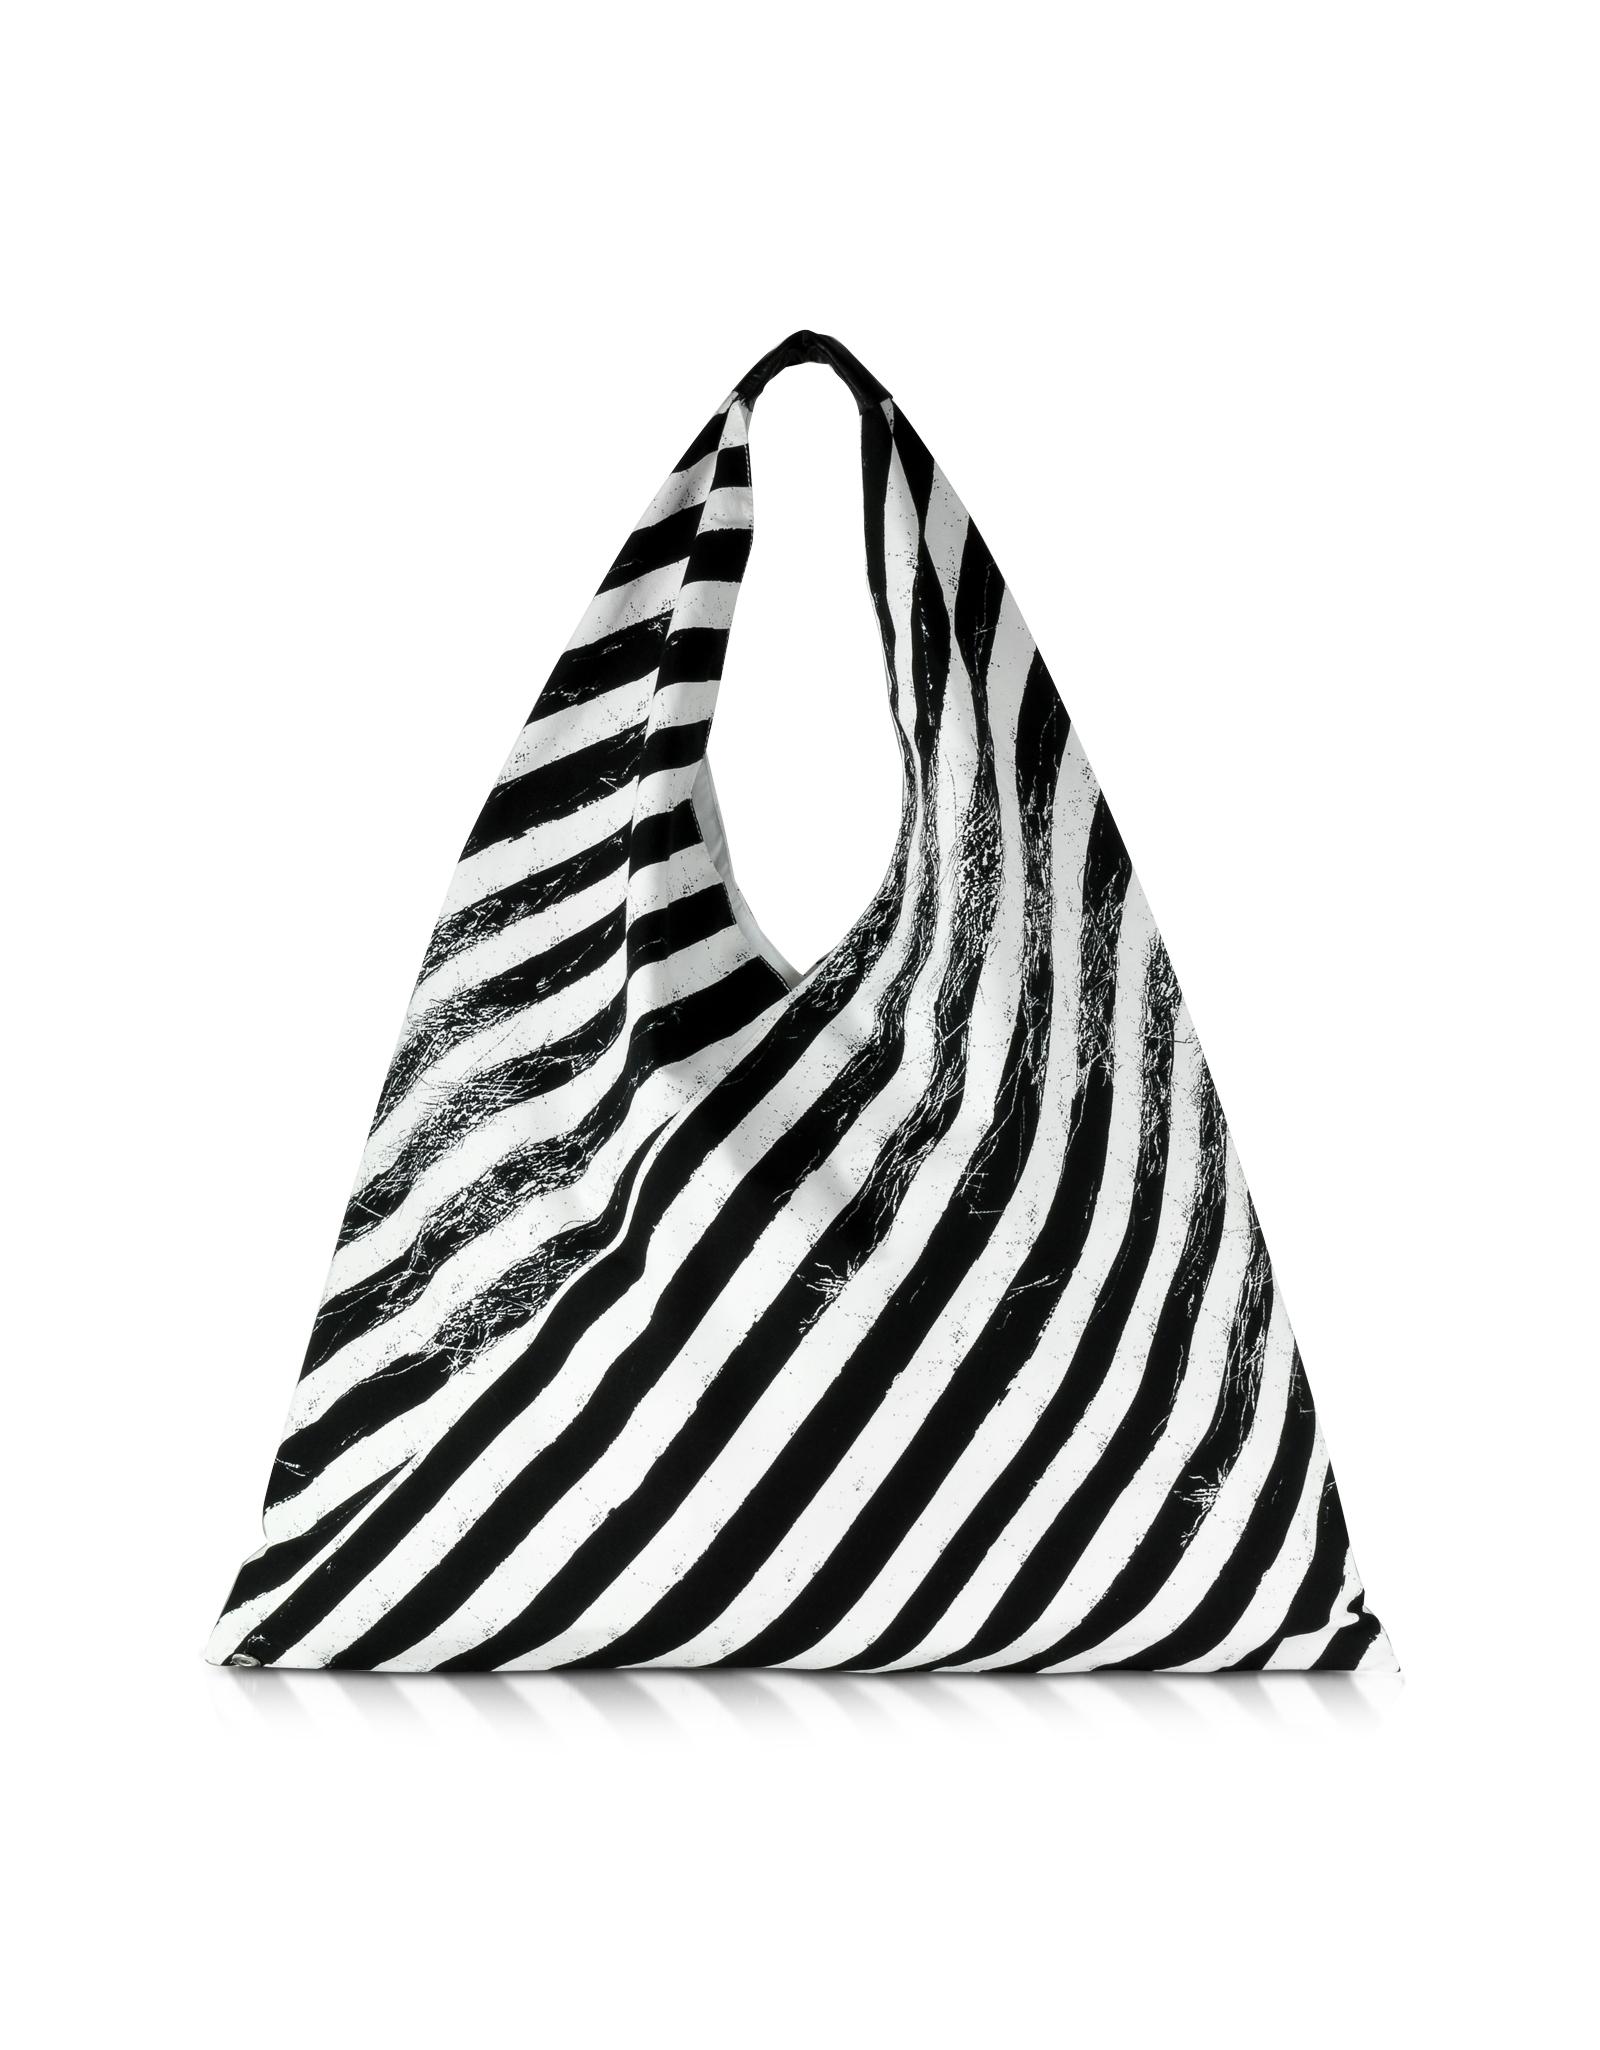 MM6 by Maison Martin Margiela Black And White Diagonal